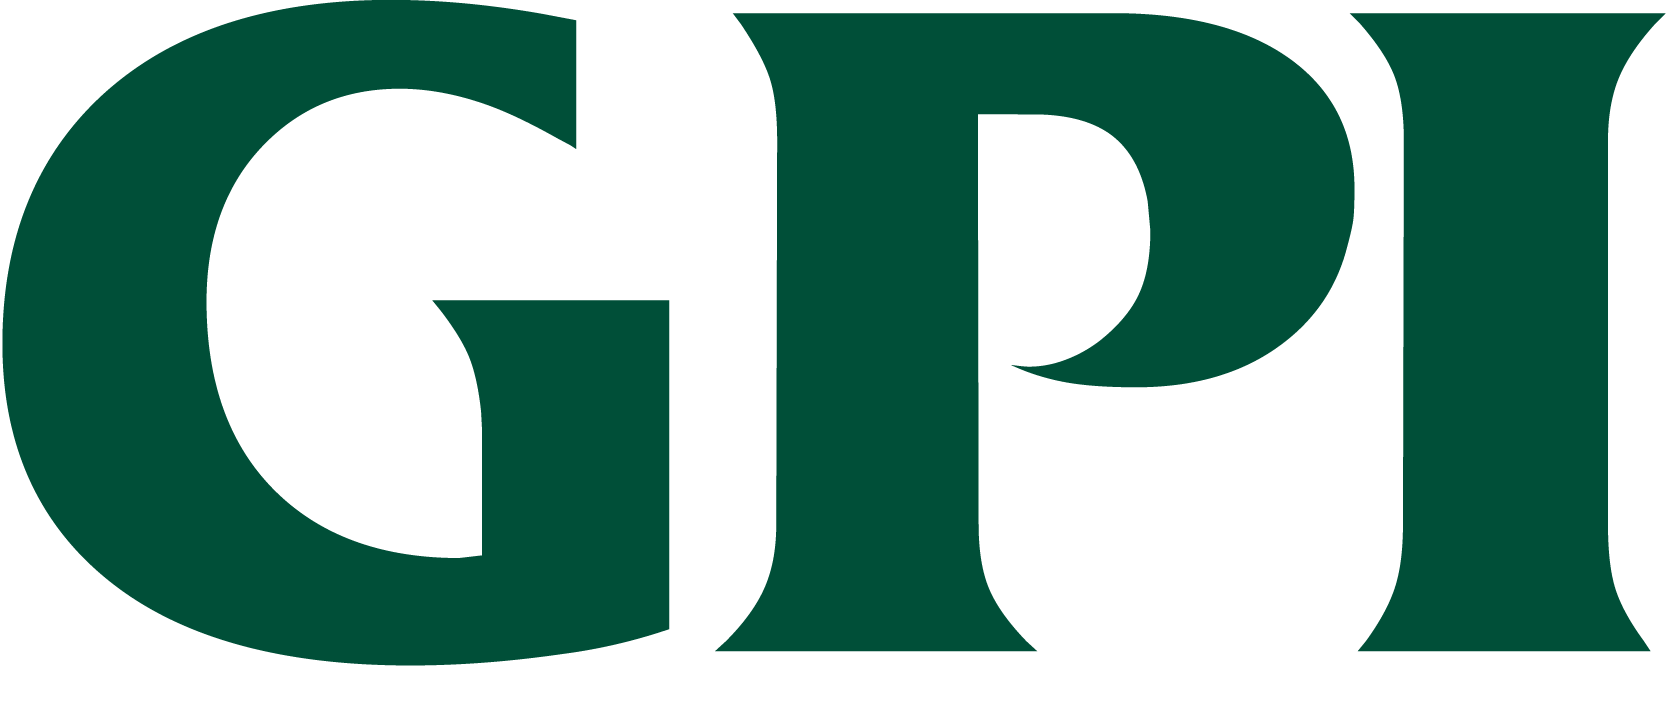 Greenman-Pedersen-logo